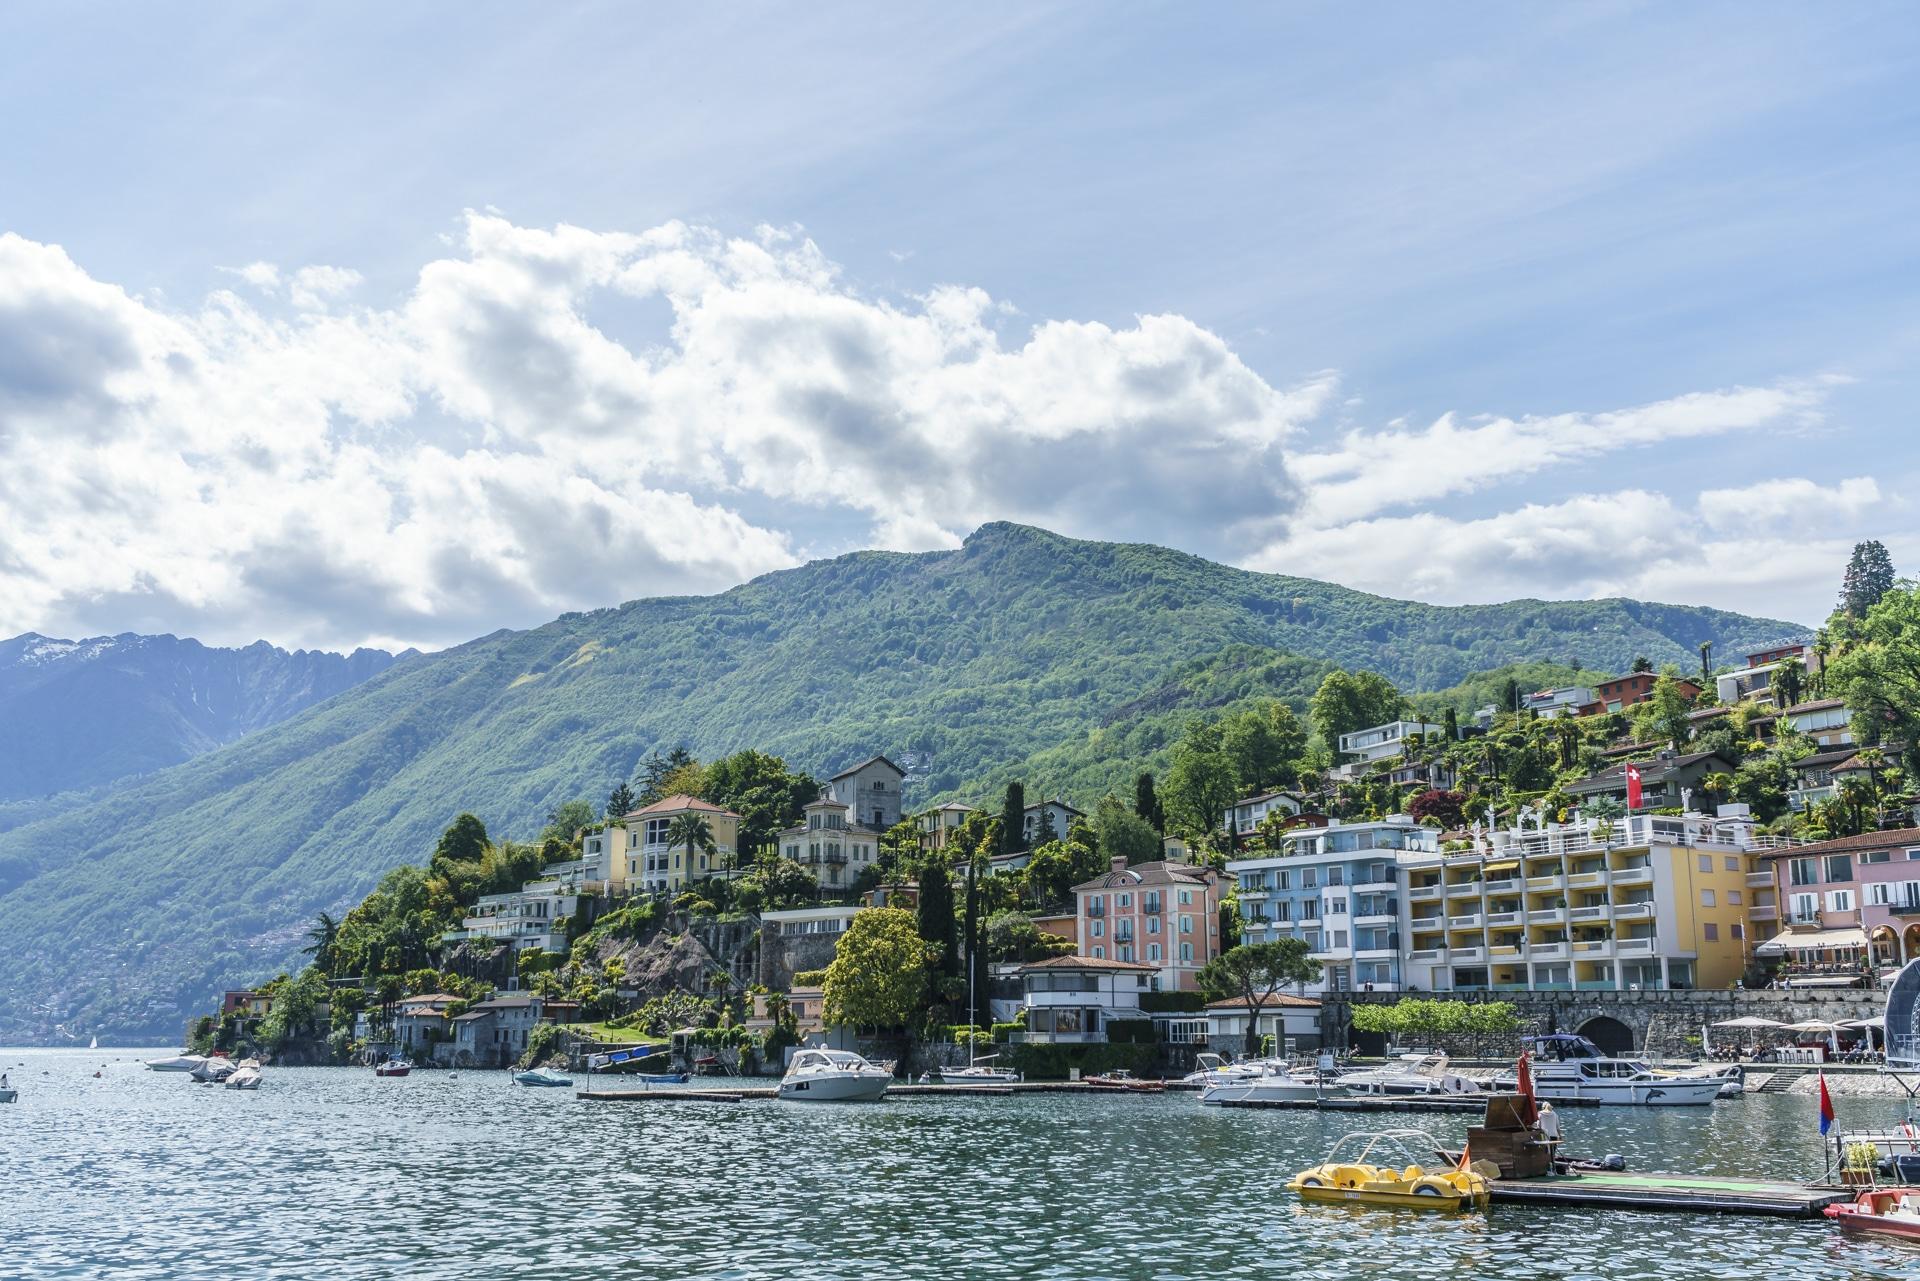 Ascona-Monte-Verita